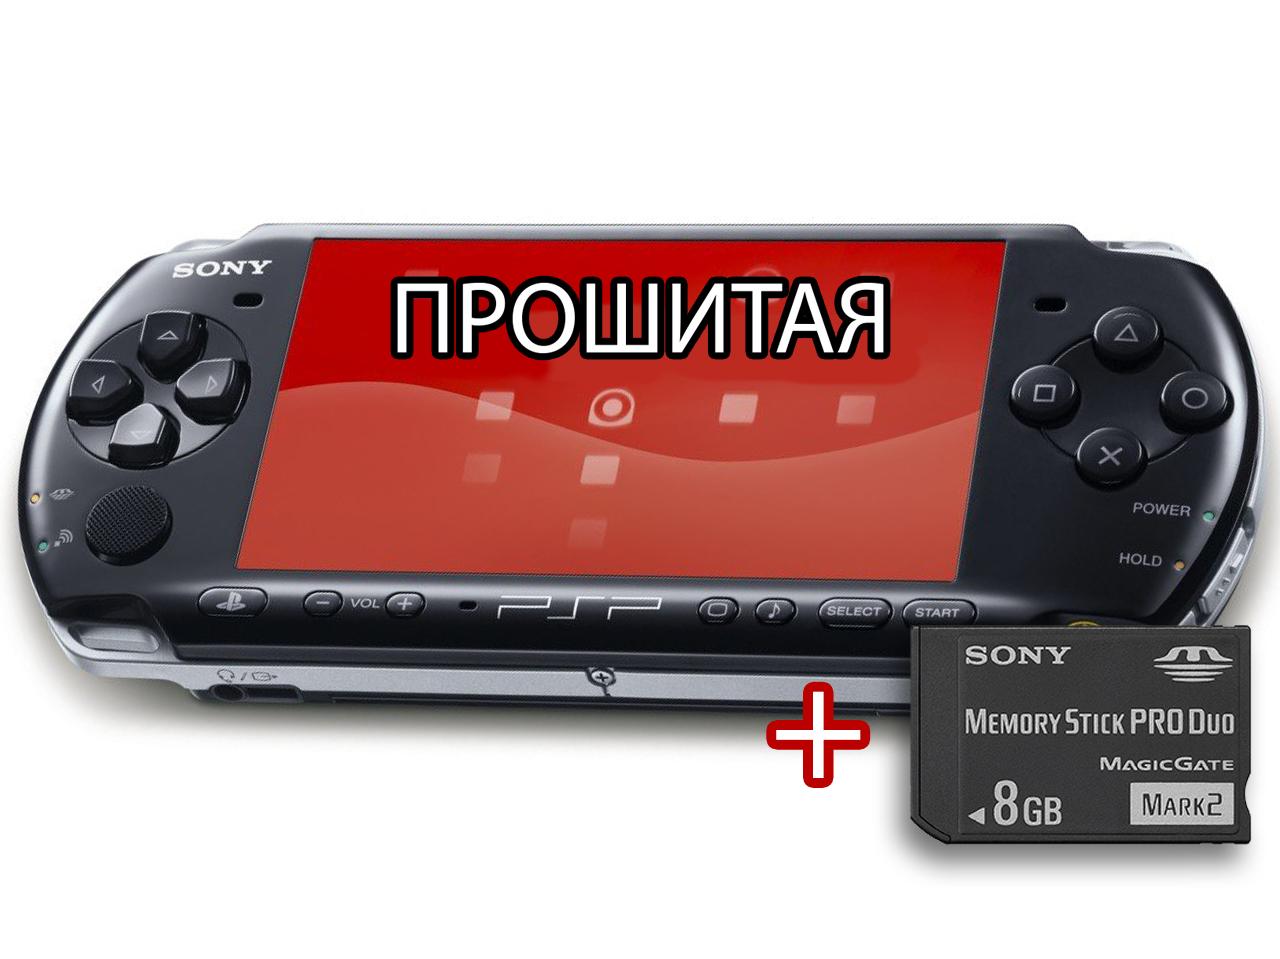 Playstation PSP — E1008 прошитая + flash 8gb